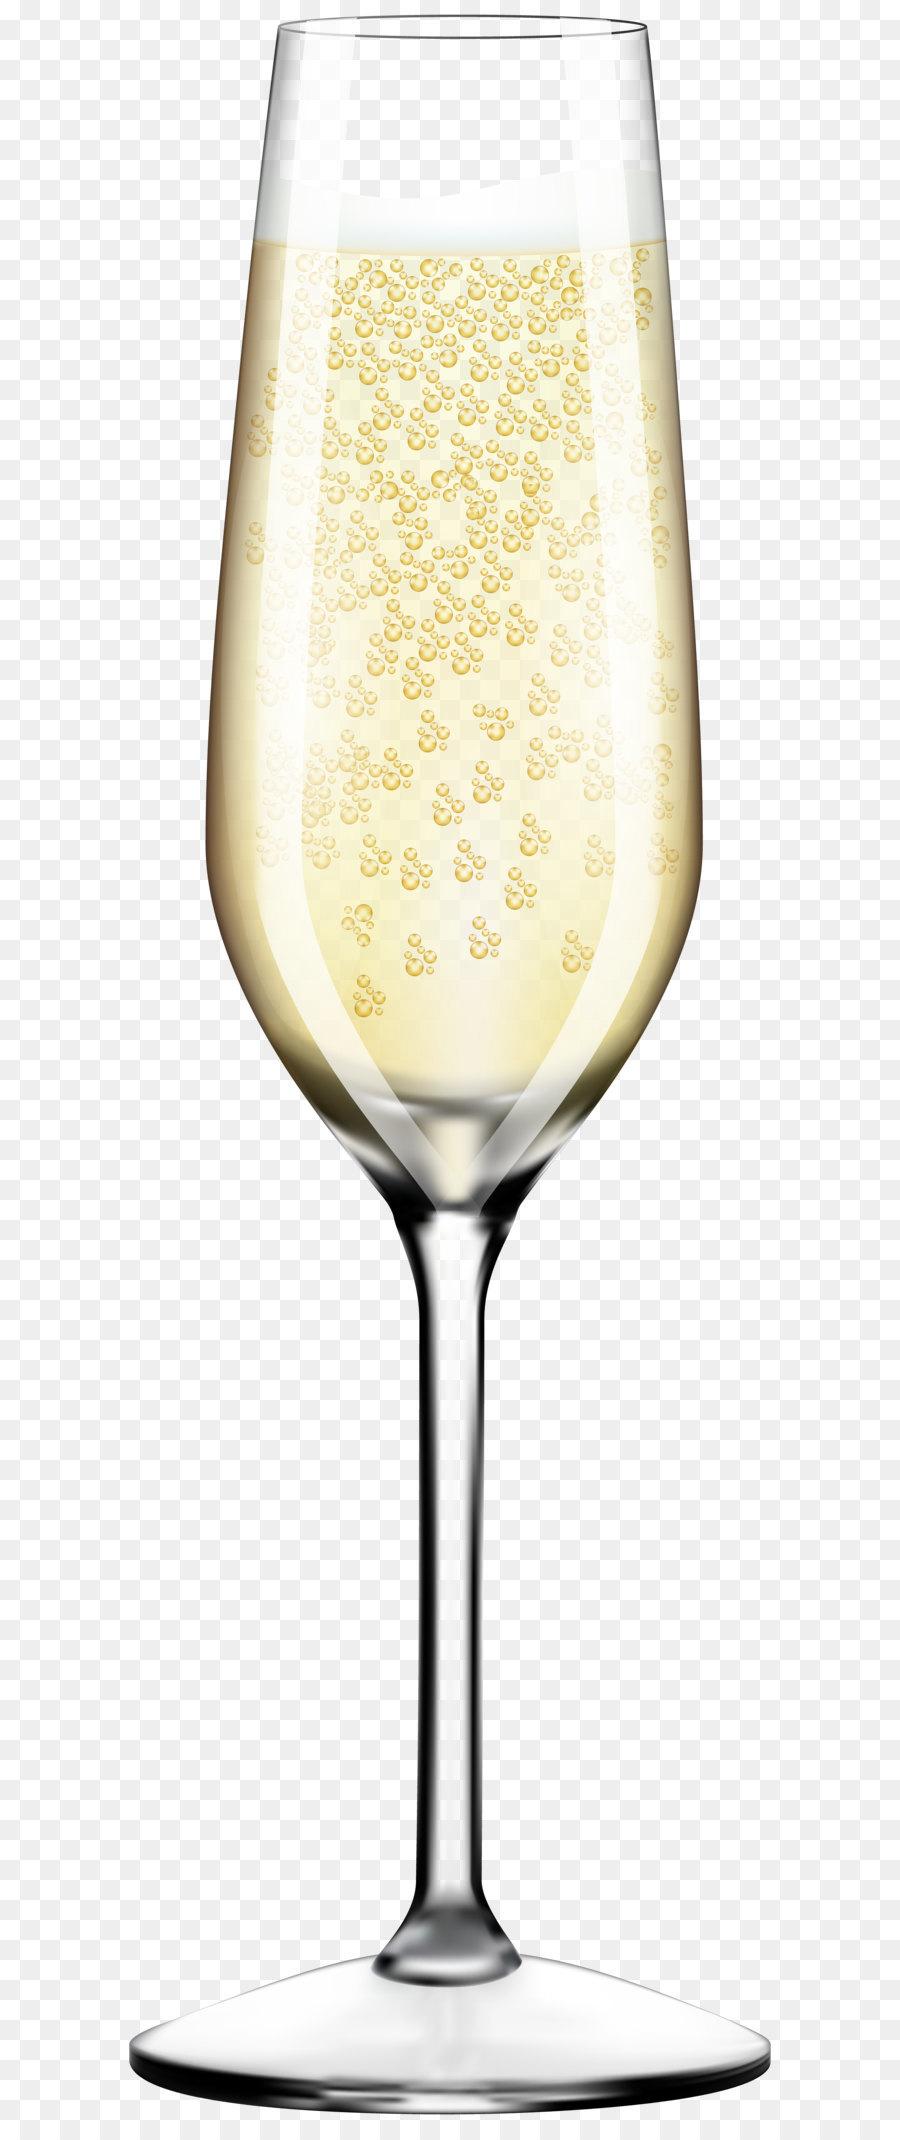 Champaign clipart mimosa glass. White wine champagne cocktail